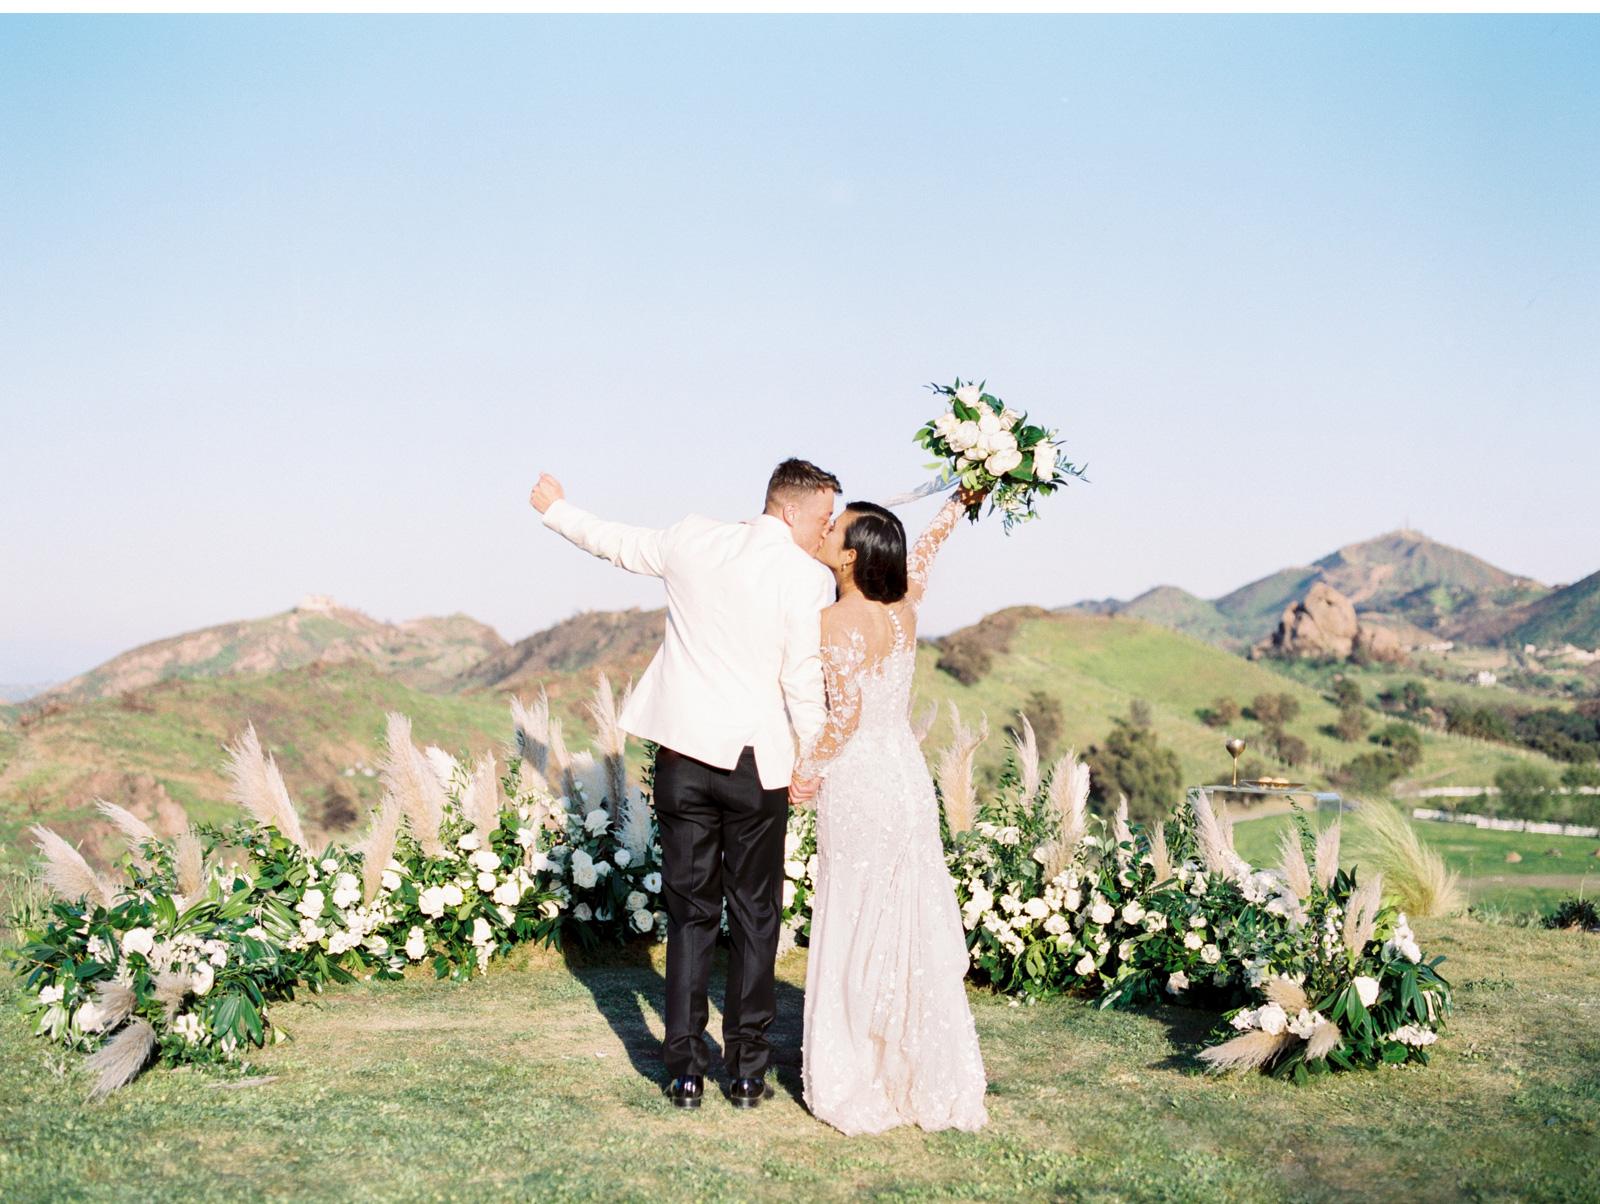 West-Coast-Weddings-Southern-California-Wedding-Photographer-Style-Me-Pretty-Fine-Art-Triunfo-Creek-Malibu-Natalie-Schutt-Photography_02.jpg